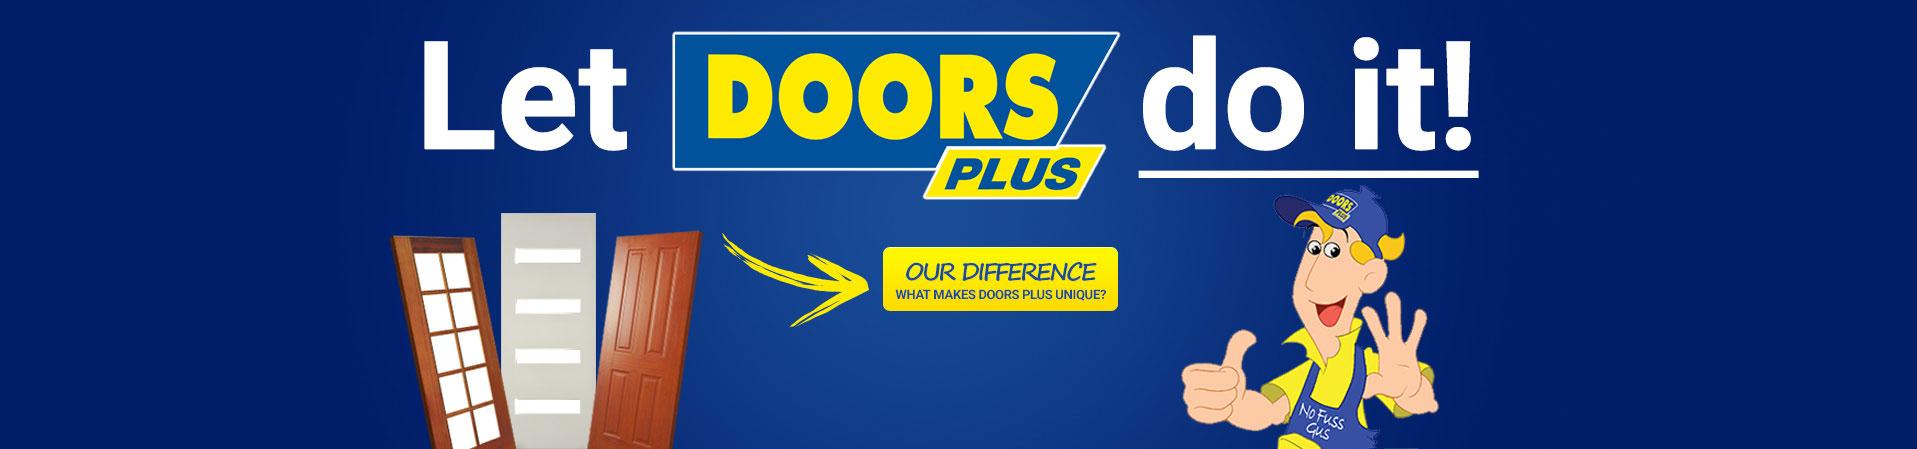 Let Doors Plus Do It